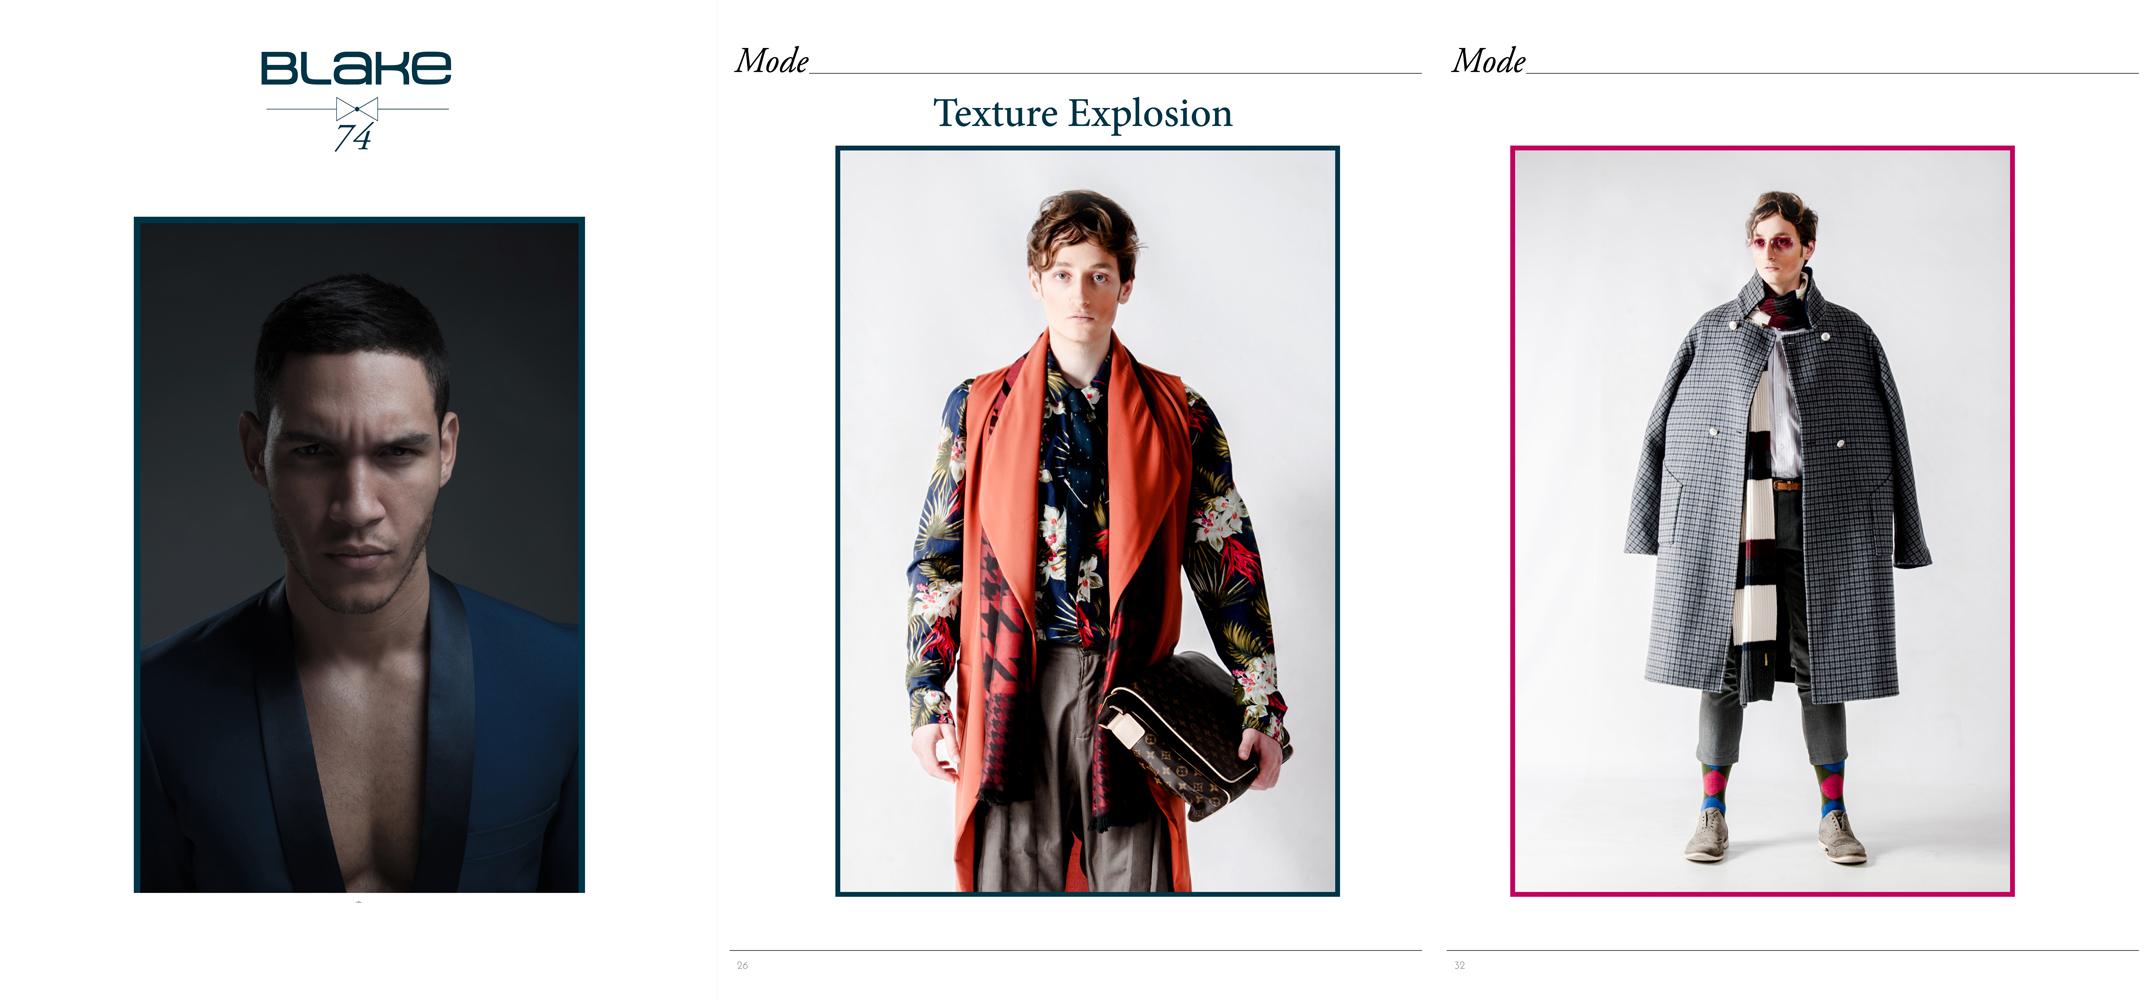 Texture Explosion